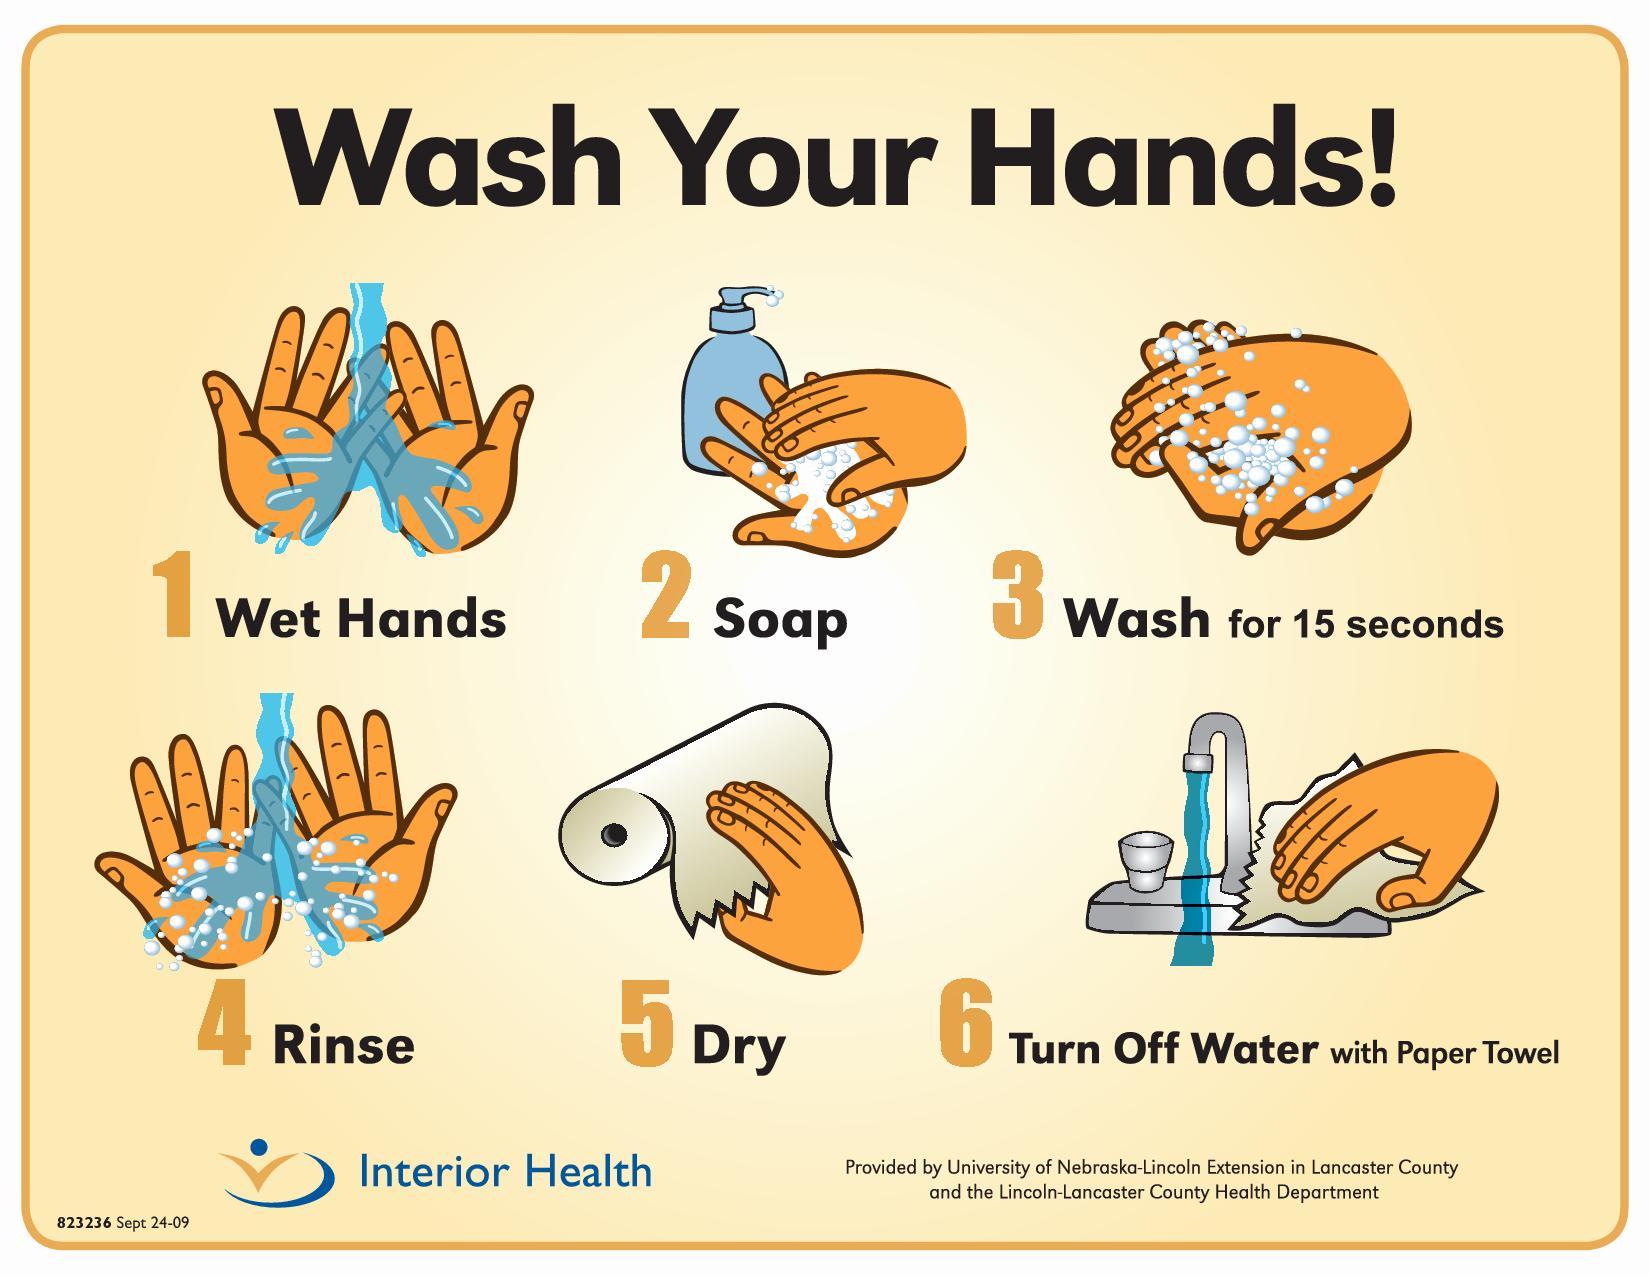 Free Printable Hand Washing Posters Templates - Tduck.ca - Free Printable Hand Washing Posters